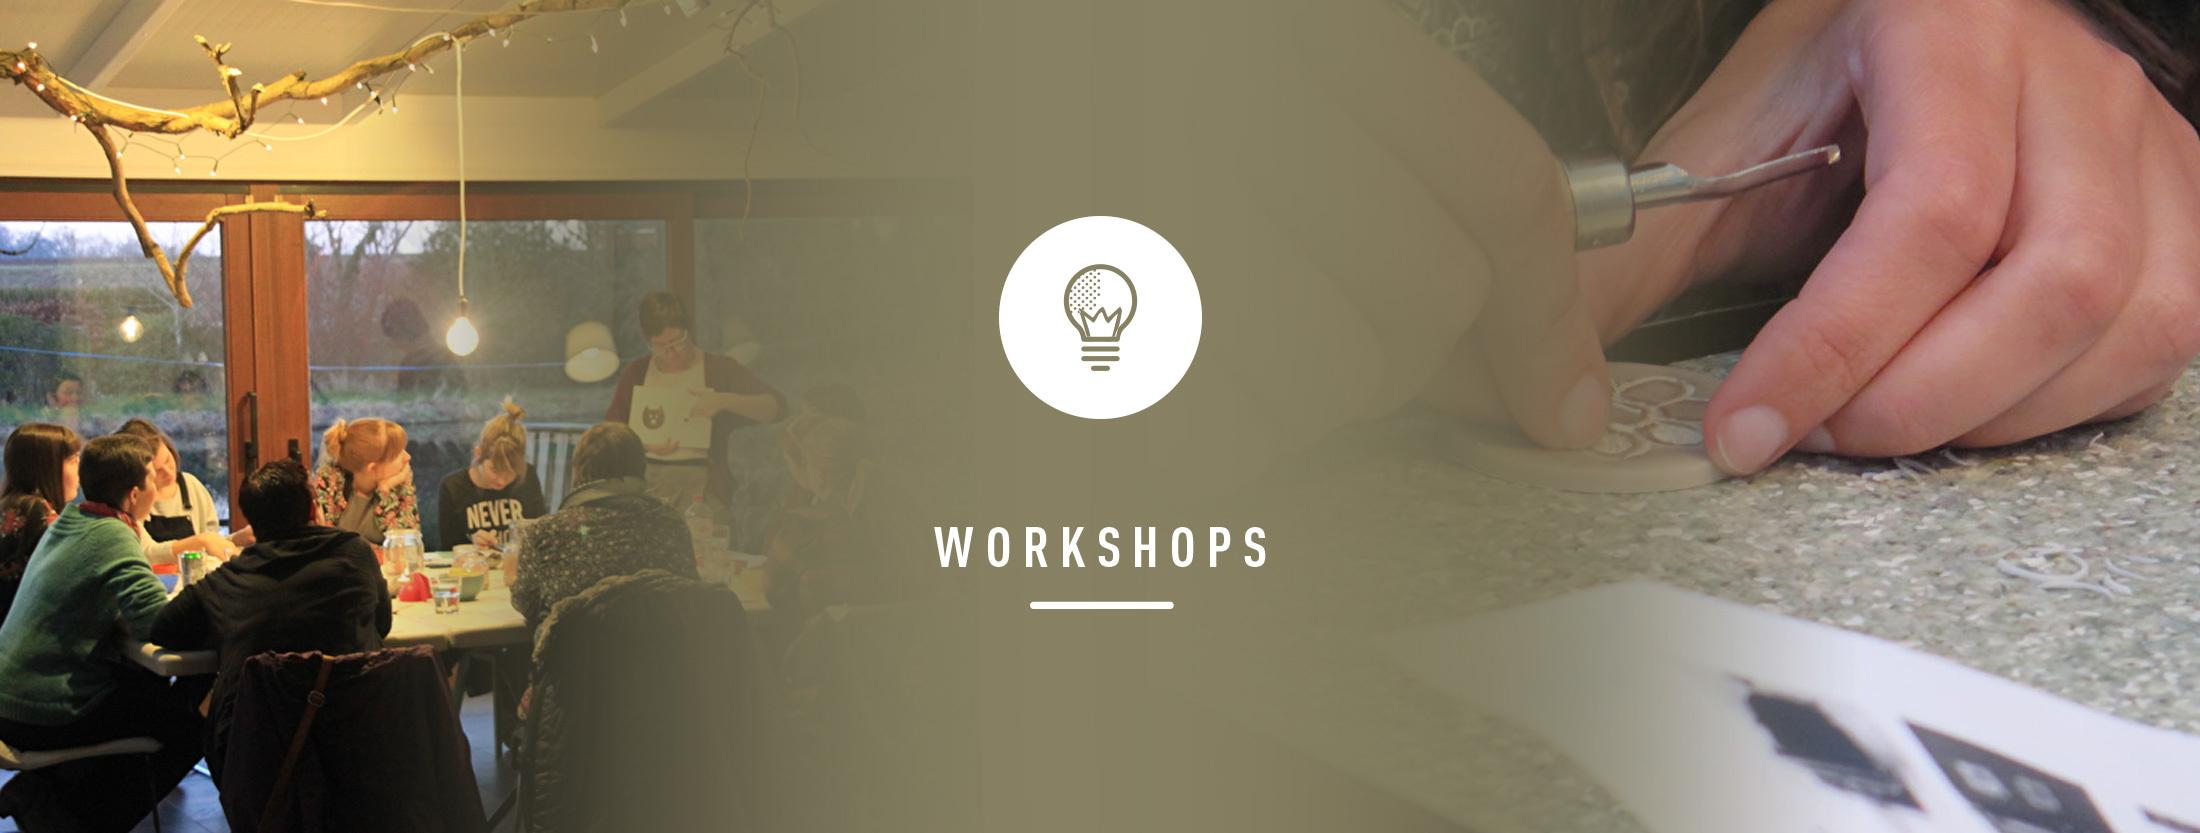 Atelier Artuur - Workshops